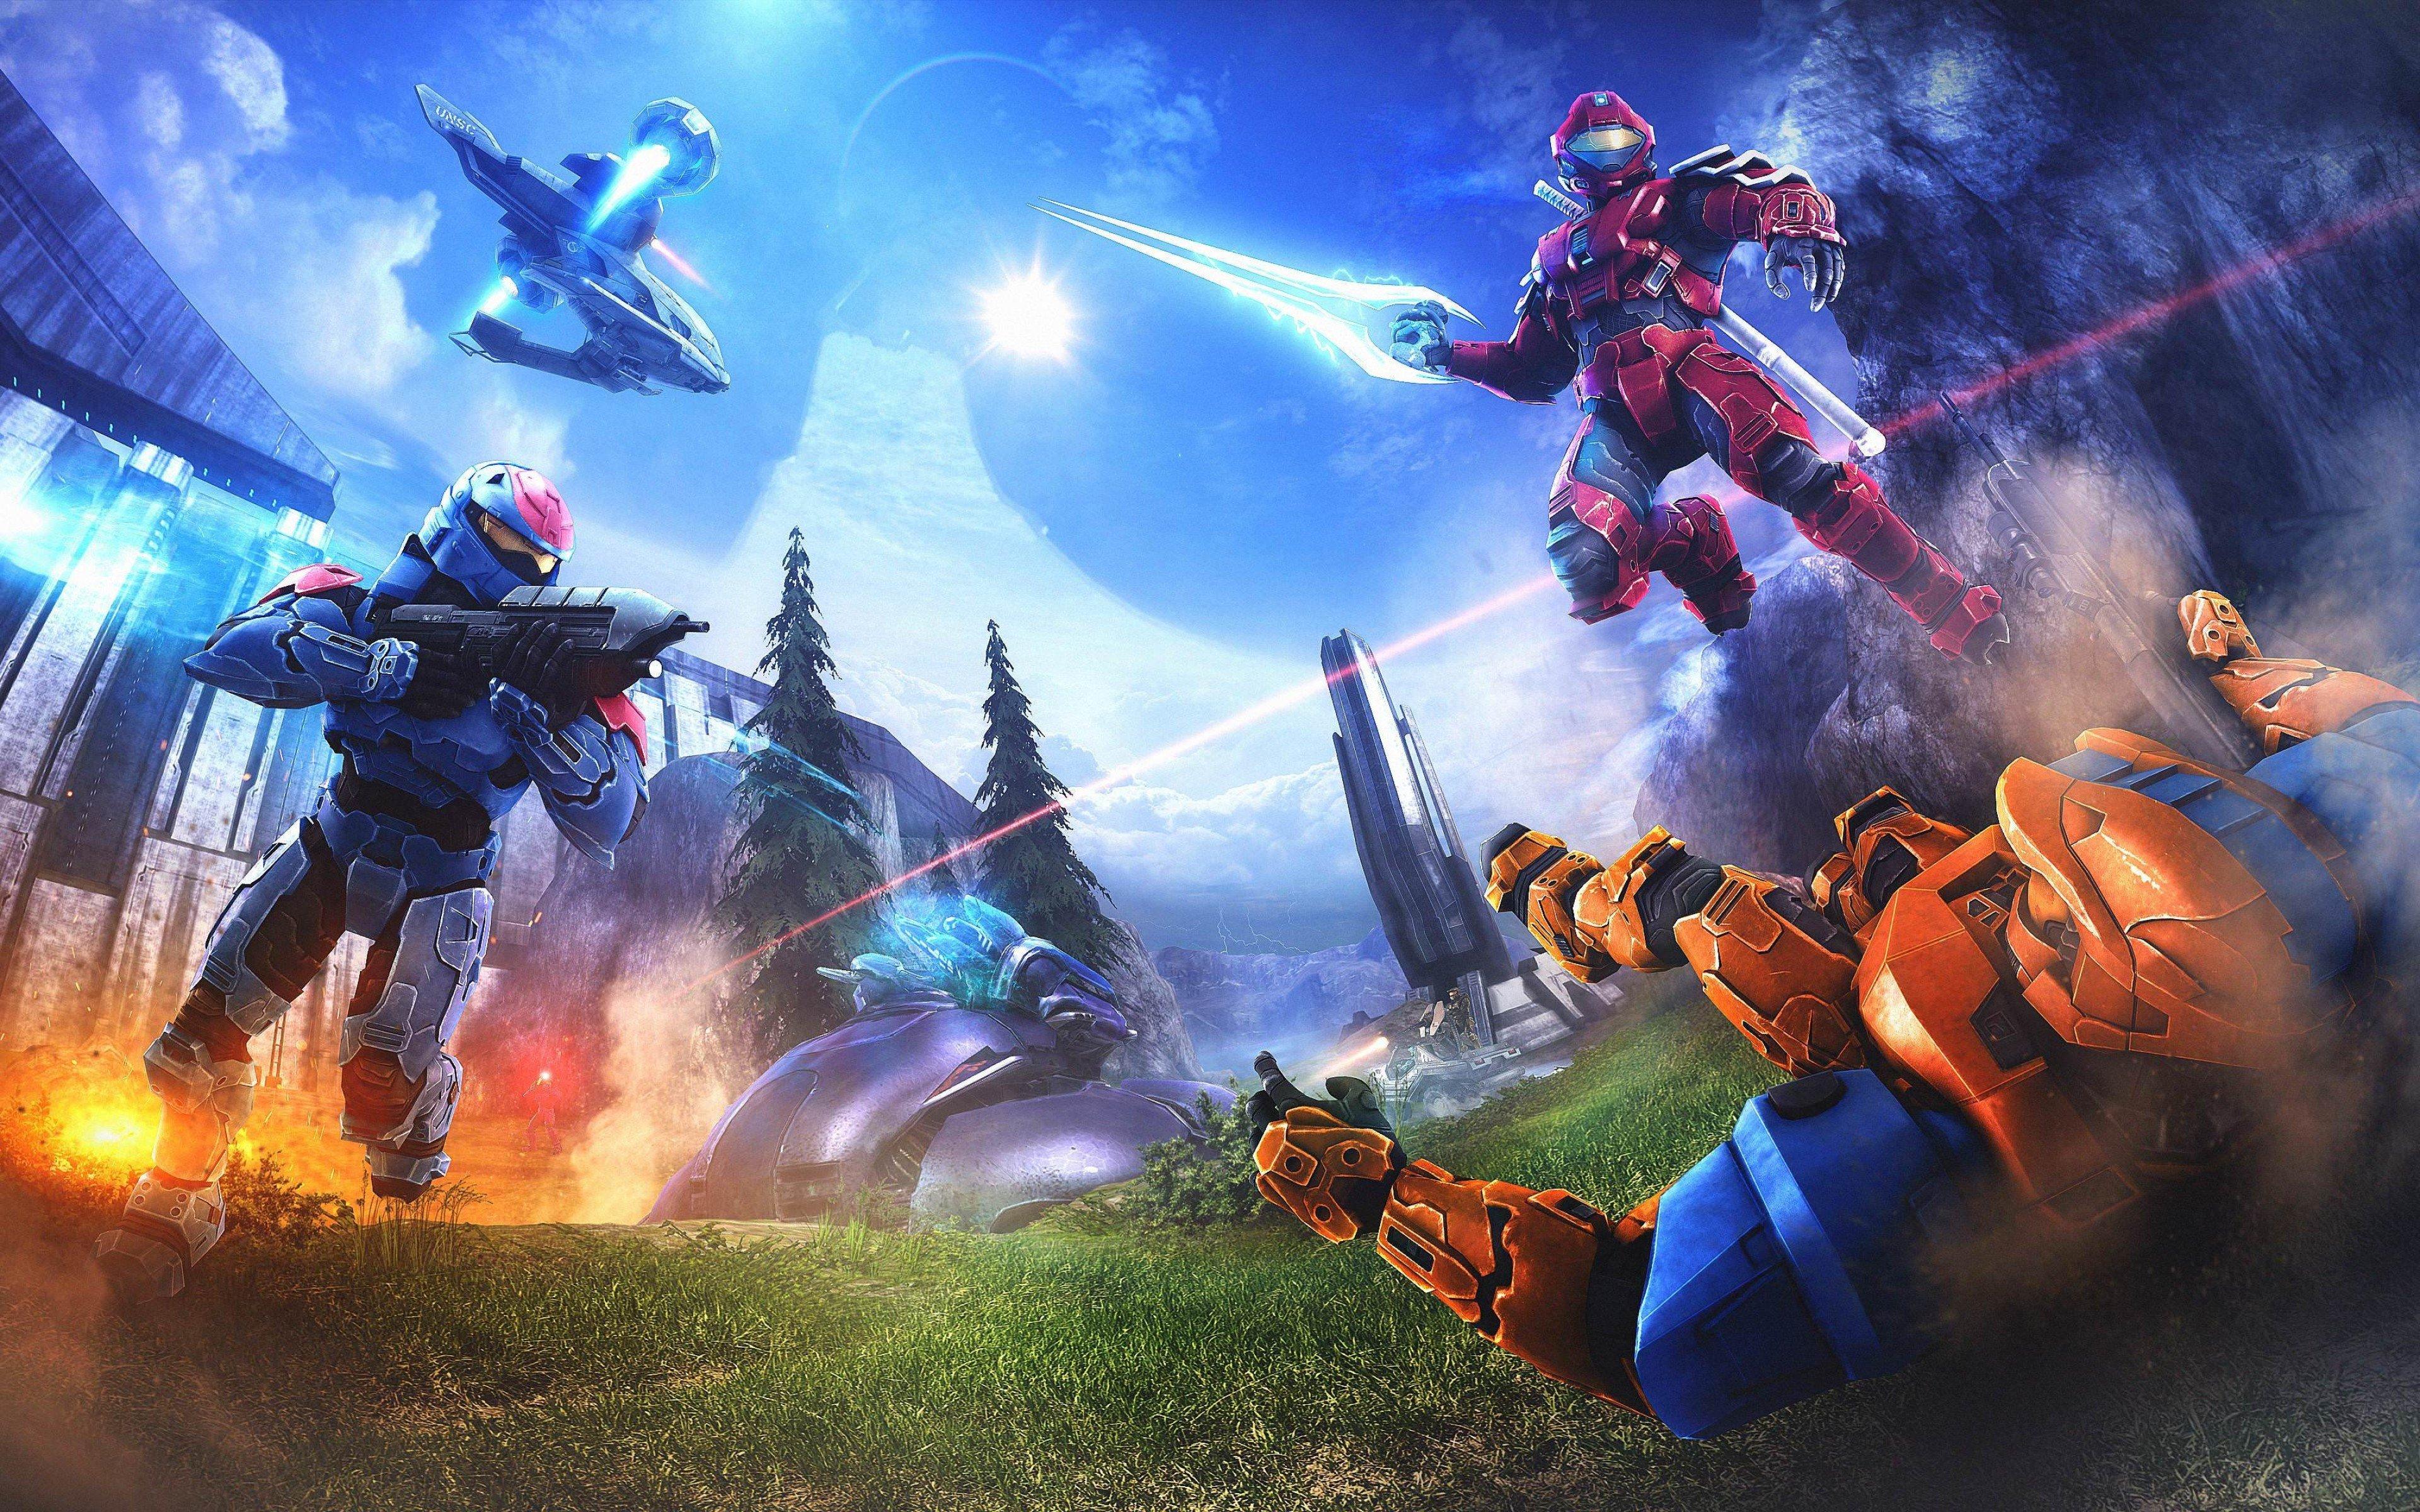 Wallpaper Videogame Halo